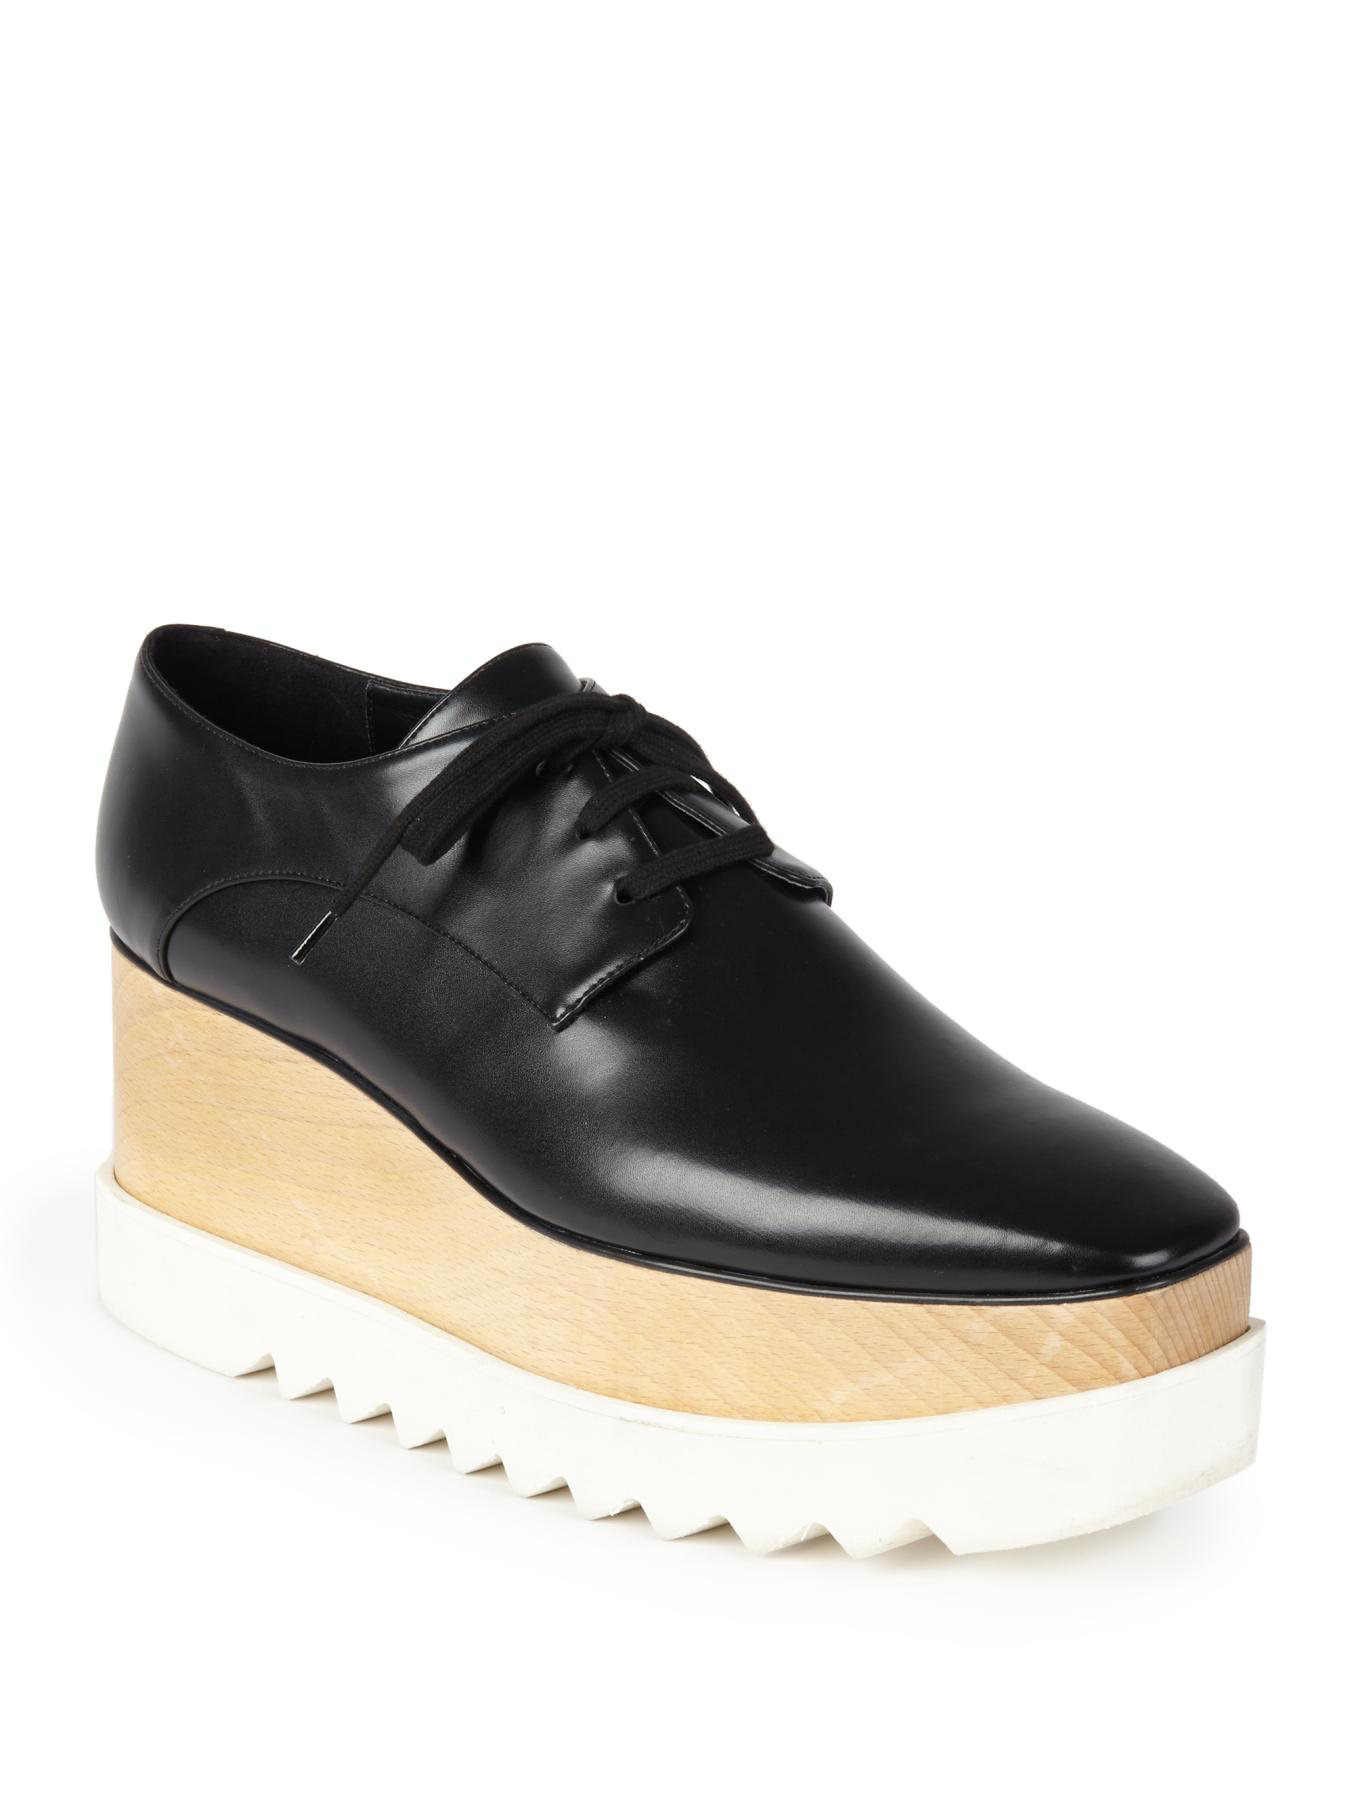 Stella mccartney Faux Leather Platform Oxfords in Black | Lyst